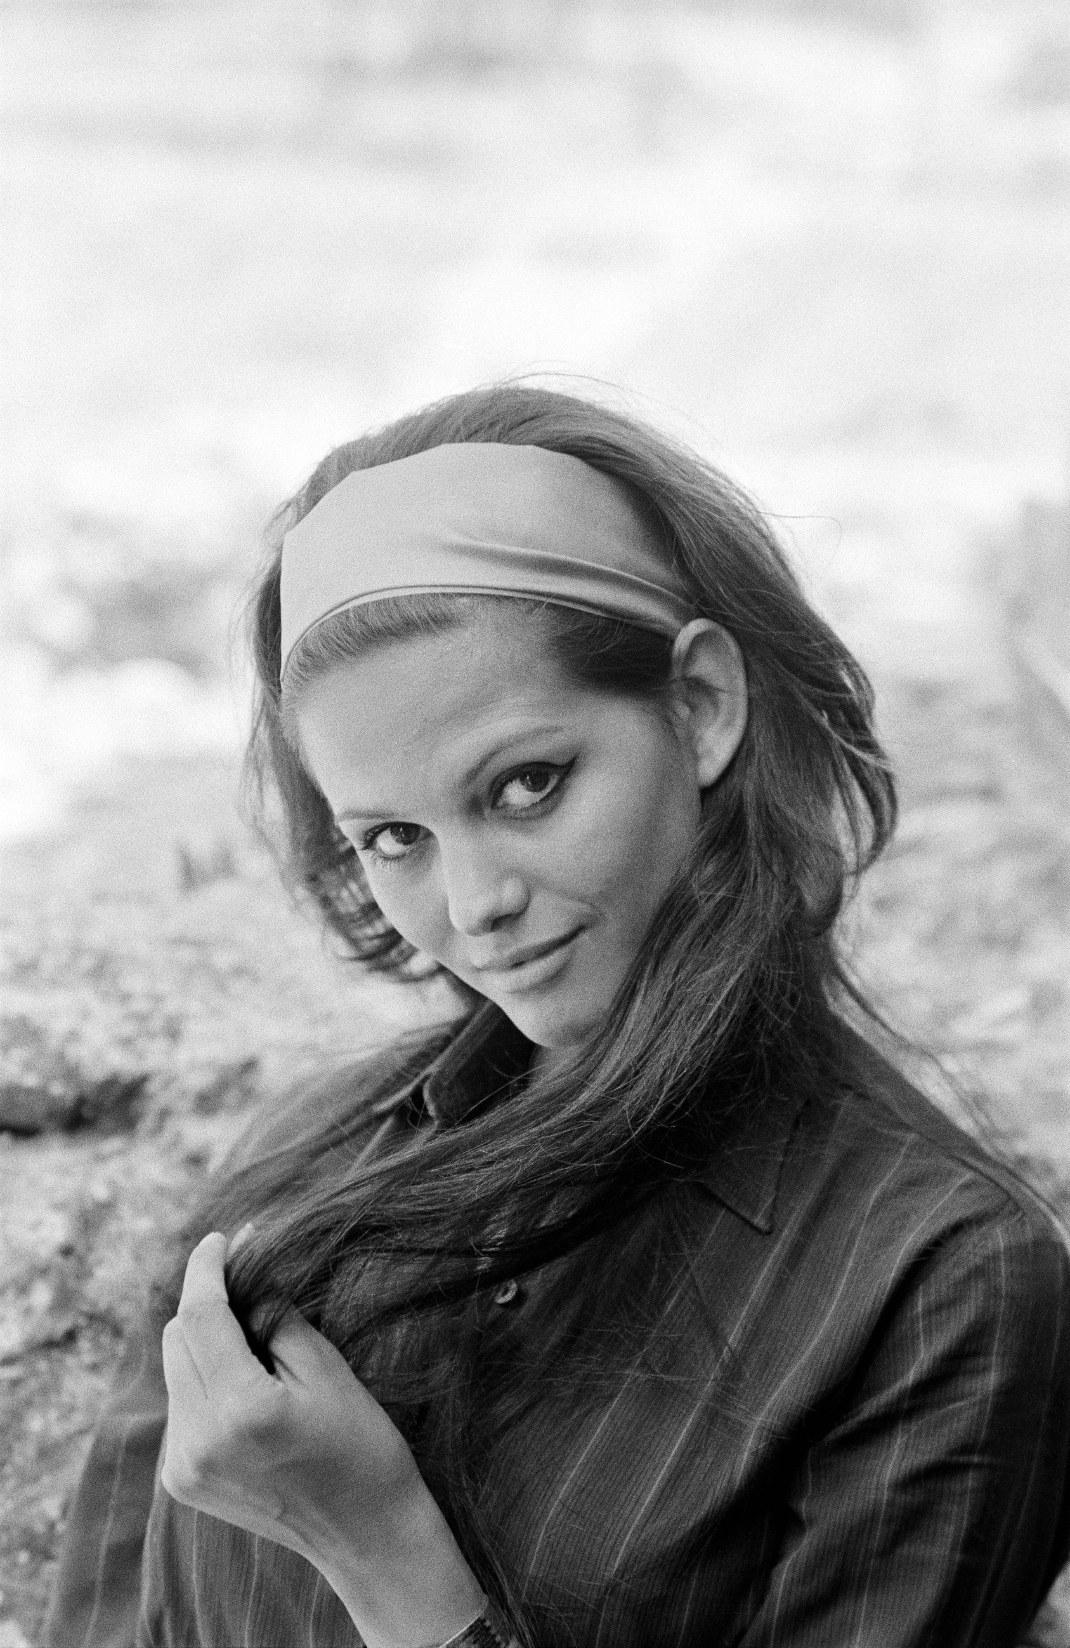 H Kλαούντια Καρντινάλε, την δεκαετία του 50/ Φωτογραφία: Getty Images/ Ideal Image